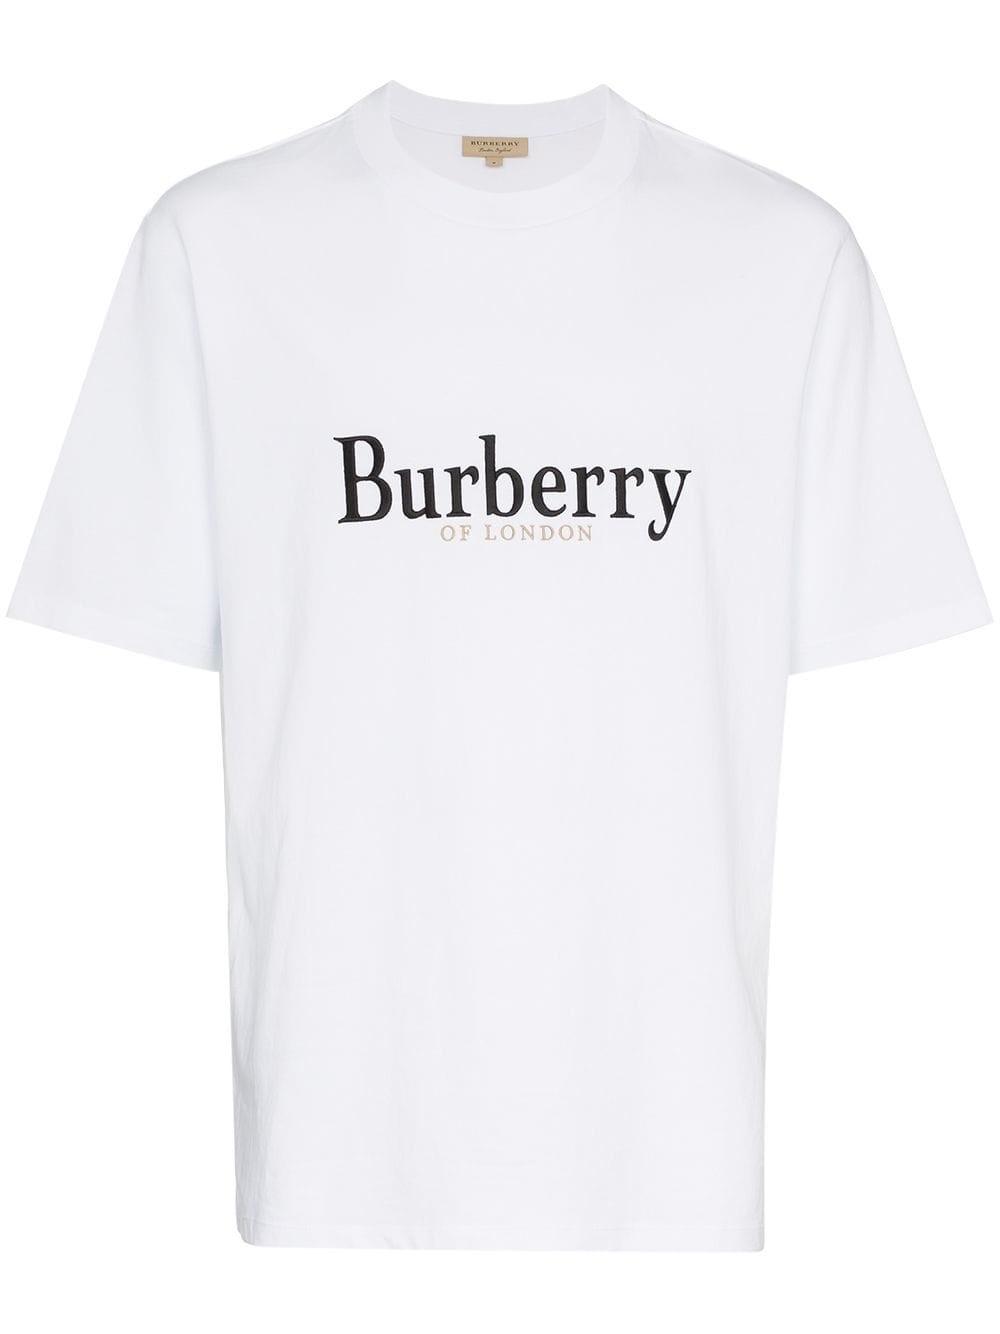 England Lopori Burberry London T 25702 Su Shirt HzBqwfWcq